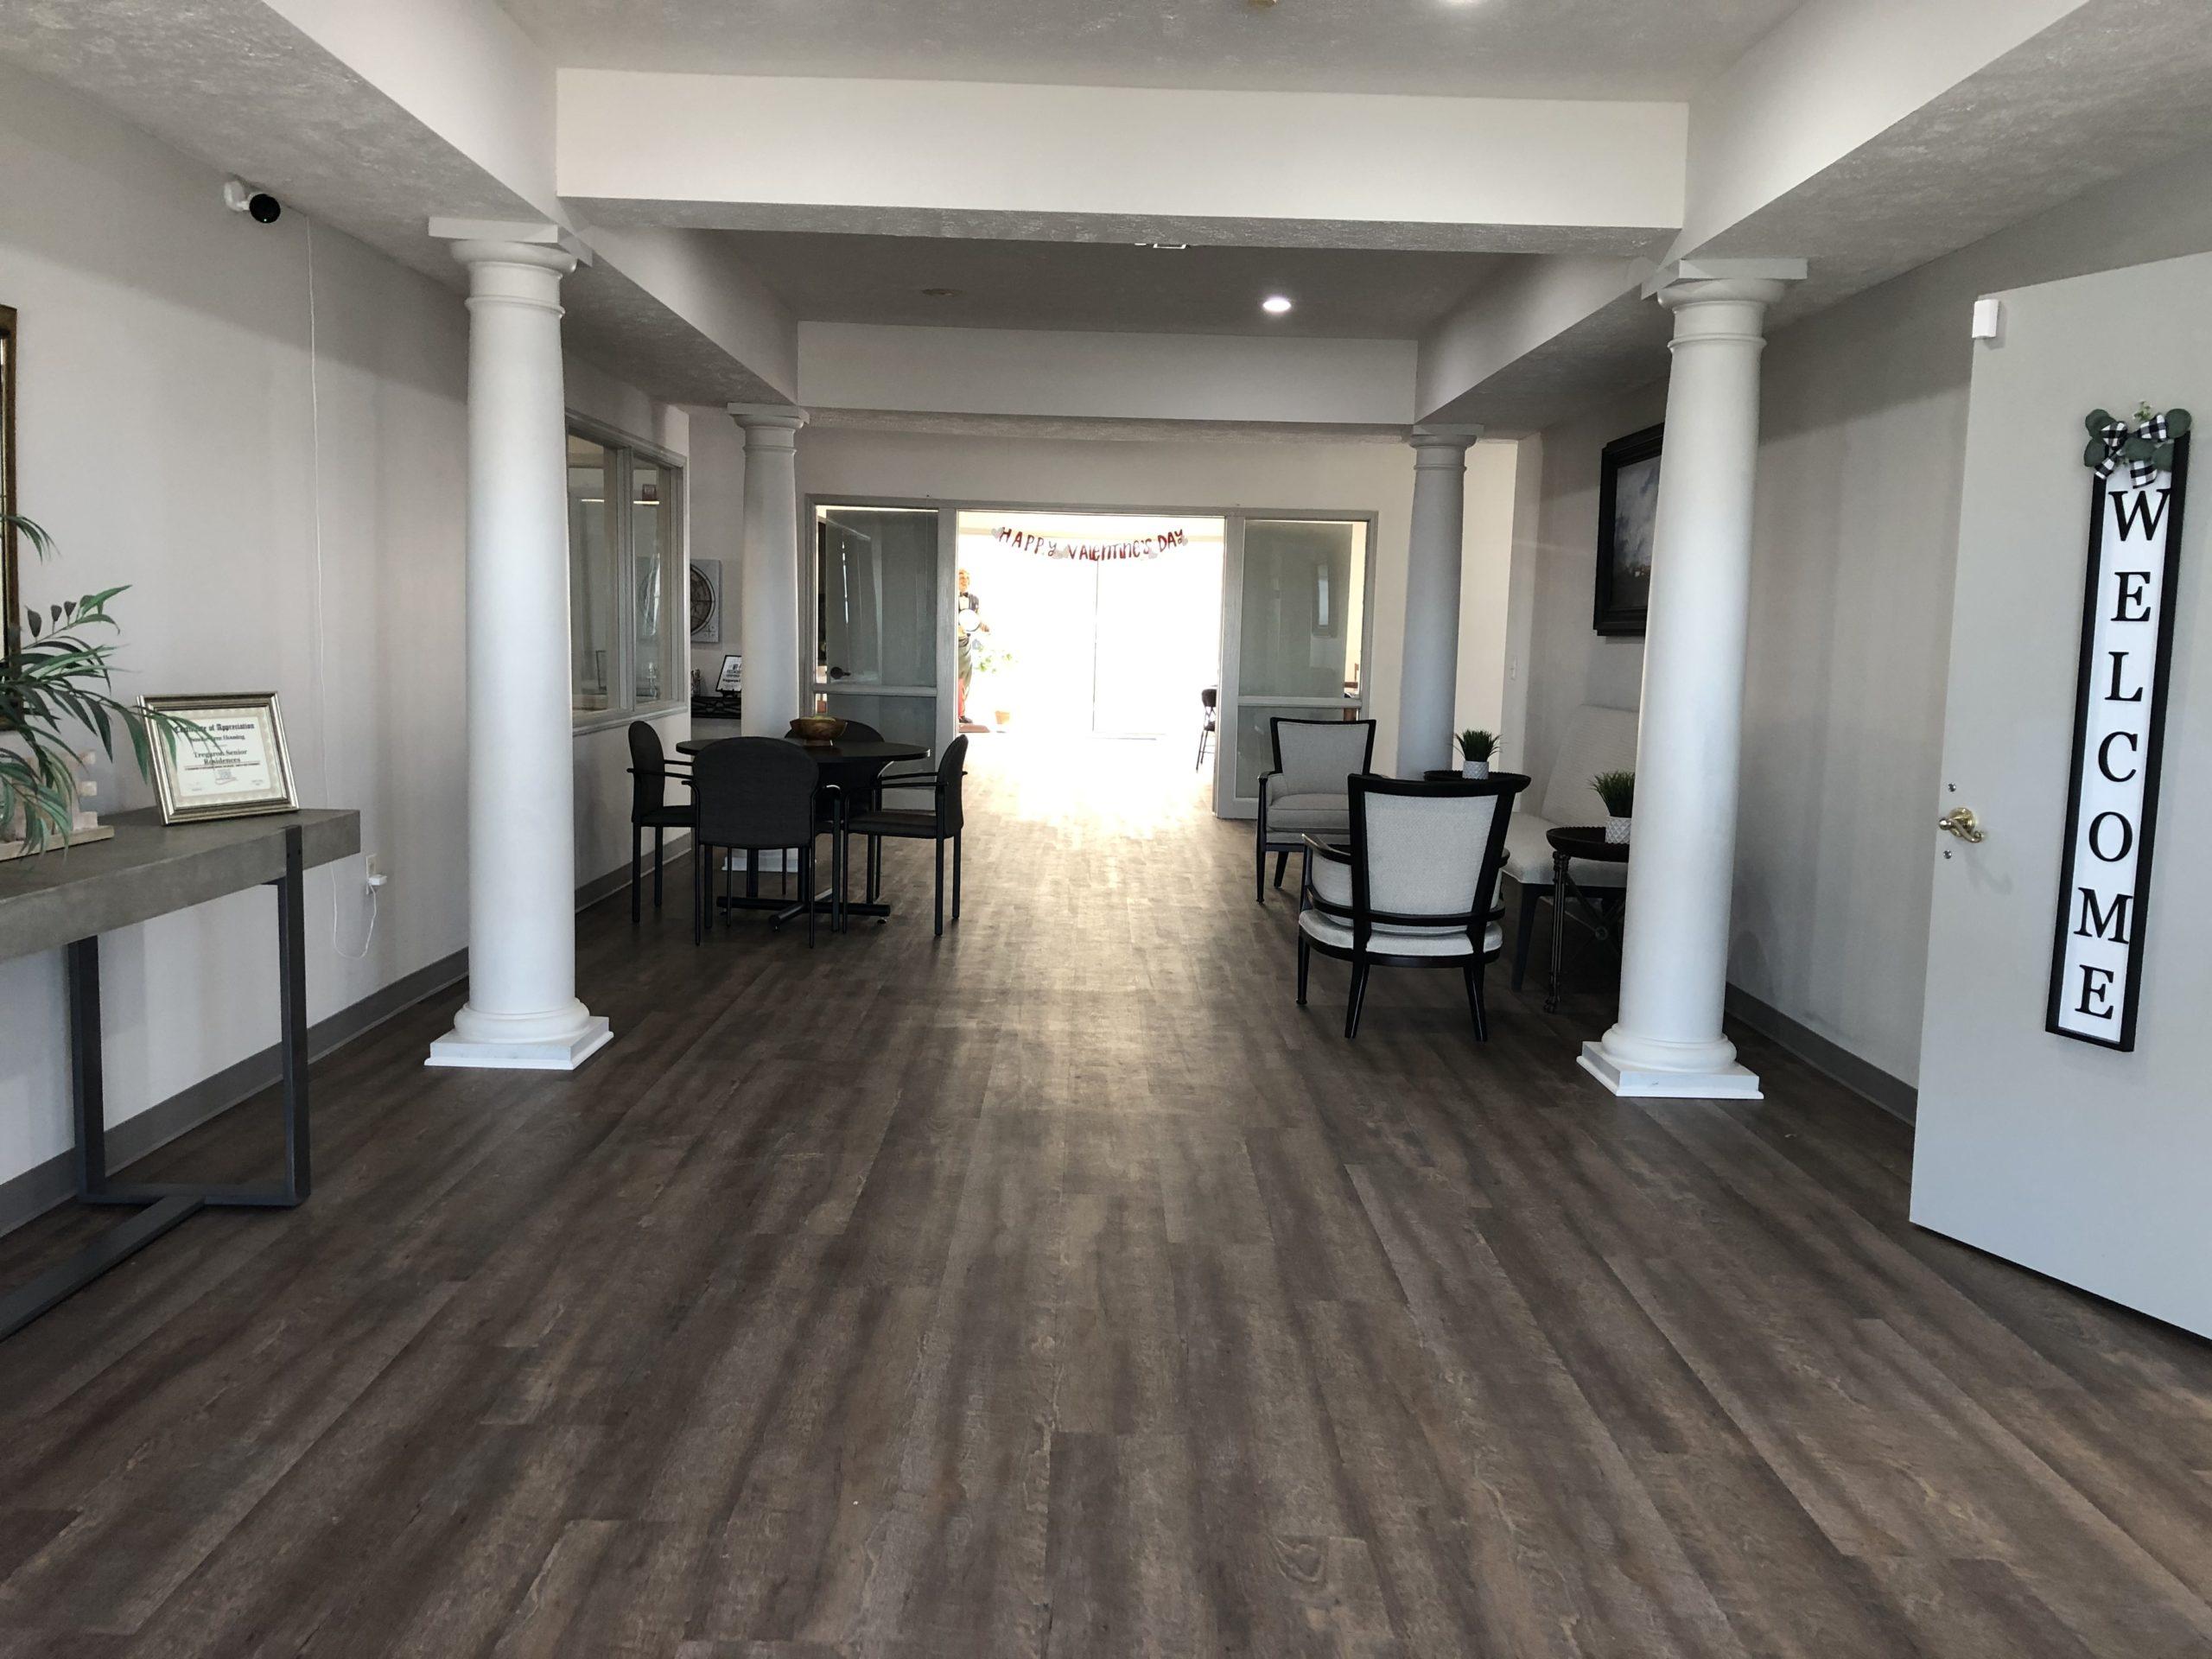 Tregaron Senior Residence Bellevue Nebraka lobby